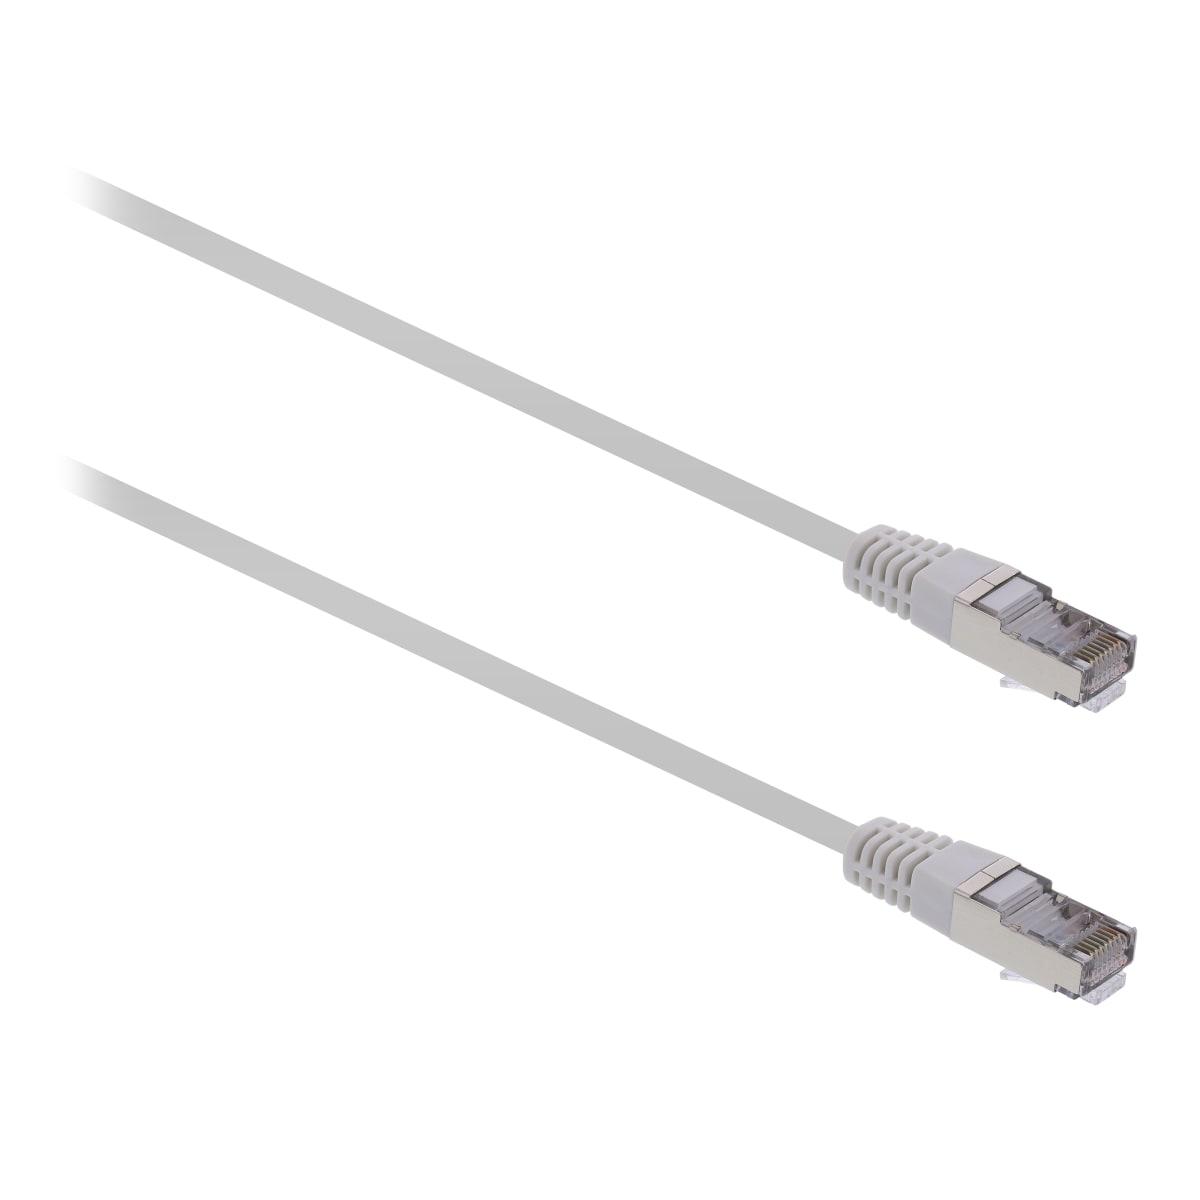 Câble RJ45 catégorie 5E 5m